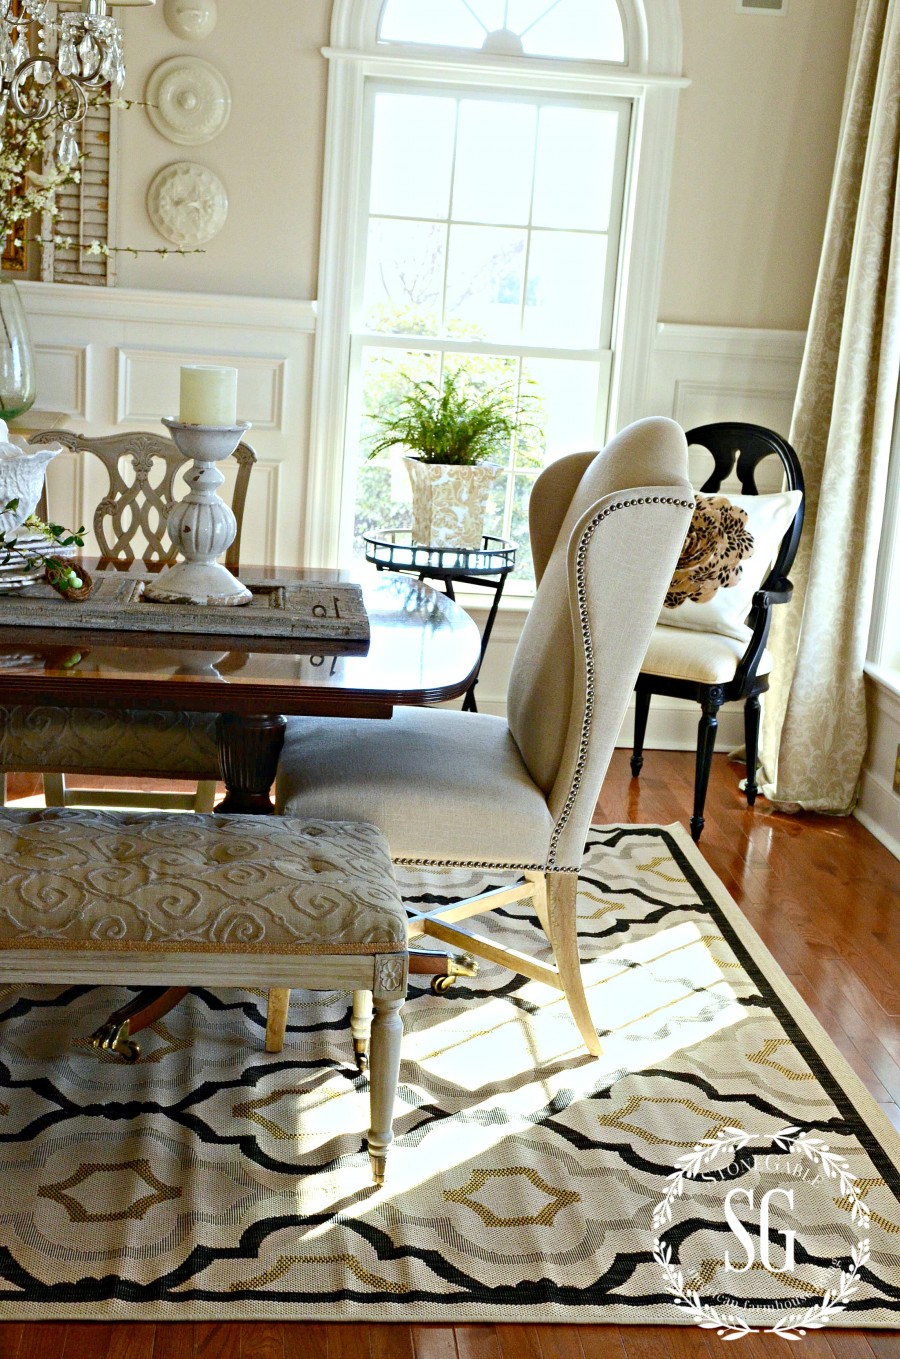 NEW DINING ROOM RUG-adding black accent color-stonegableblog.com